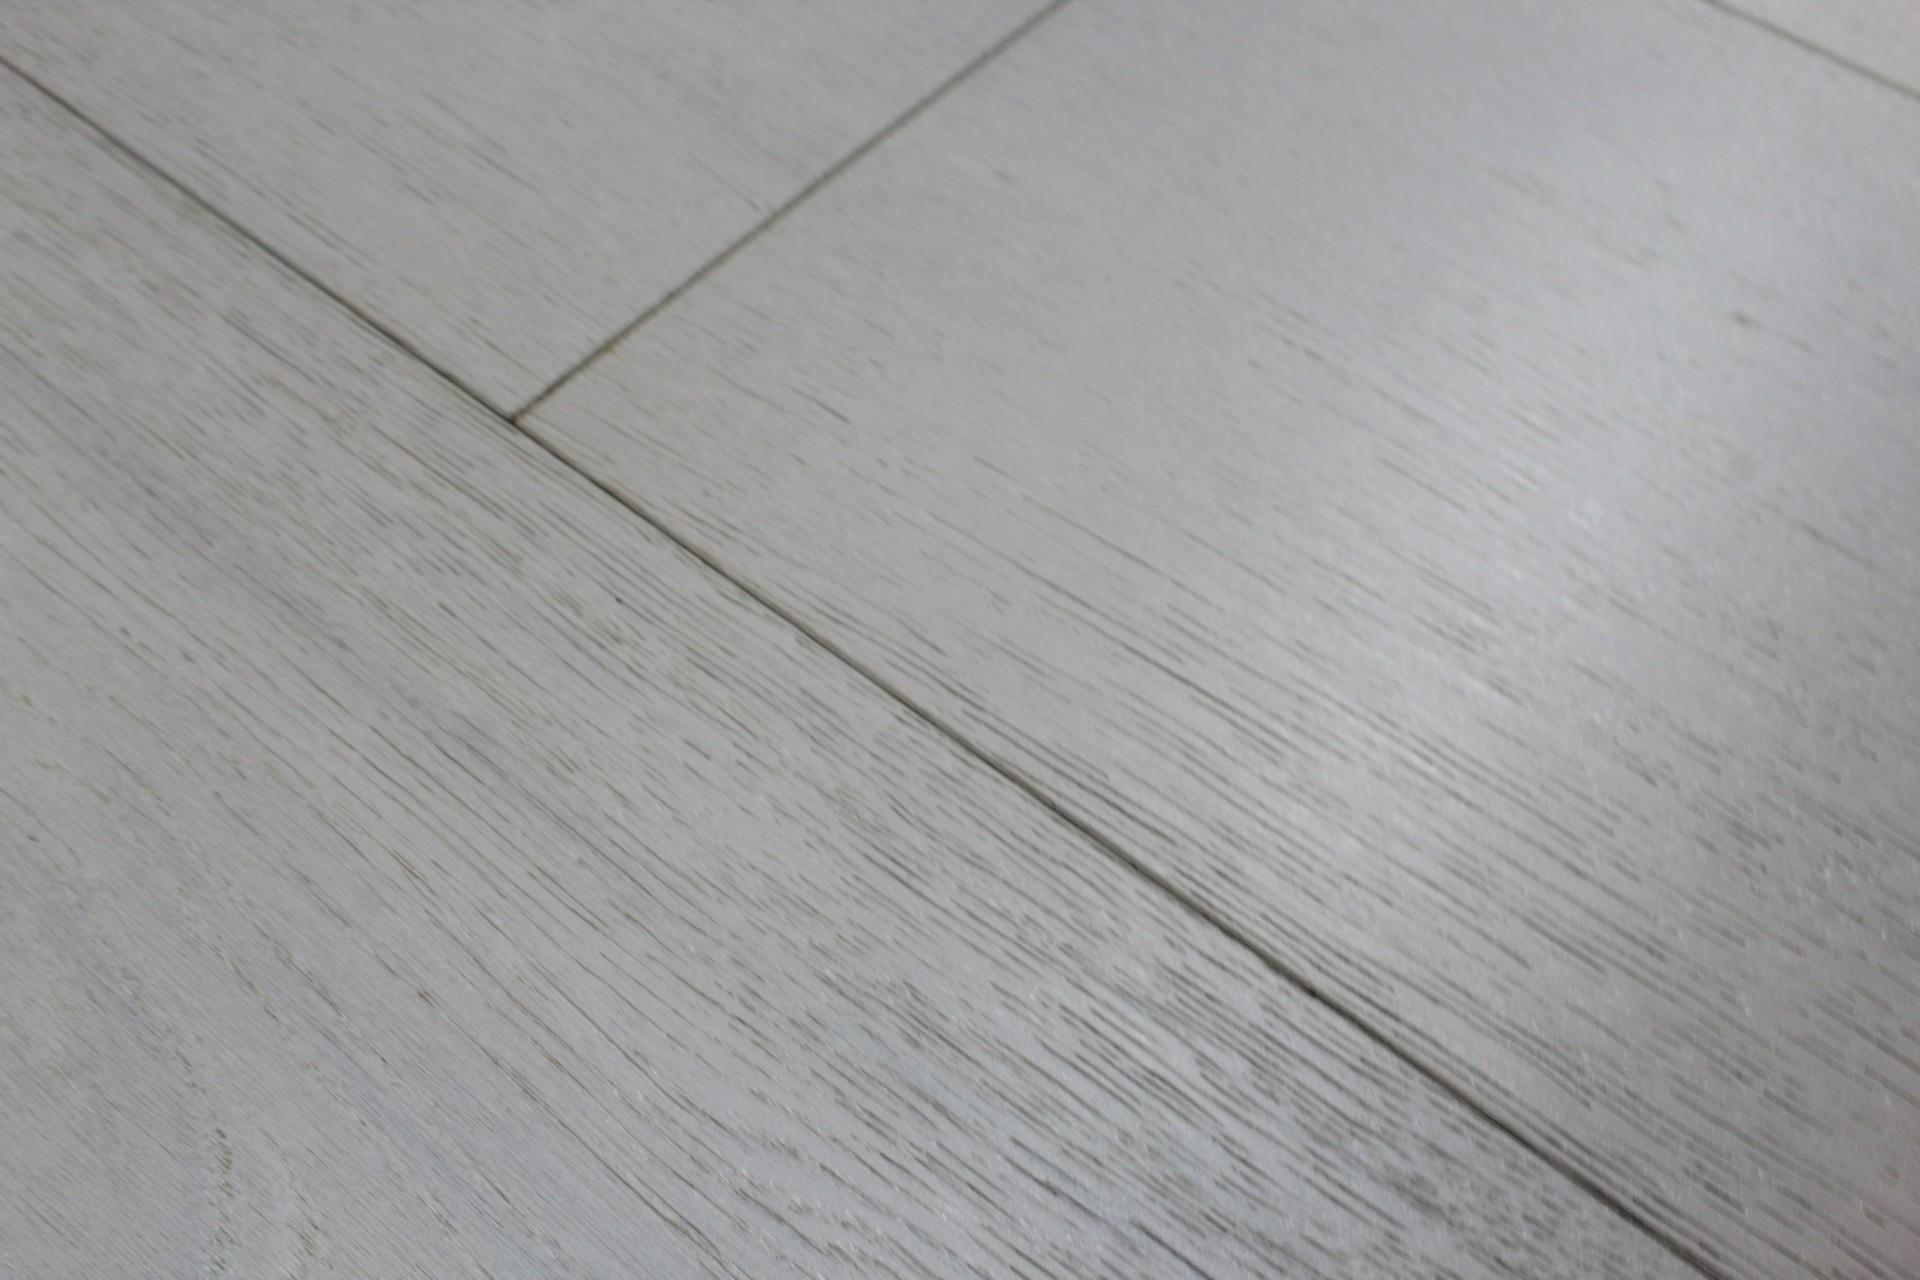 Hardwood, prefinished floor, engineered wood, solid wood, lifestyle, hard surface, prefinished hardwood, prefinished wood, home, design, interior design, wood floor design, bella citta